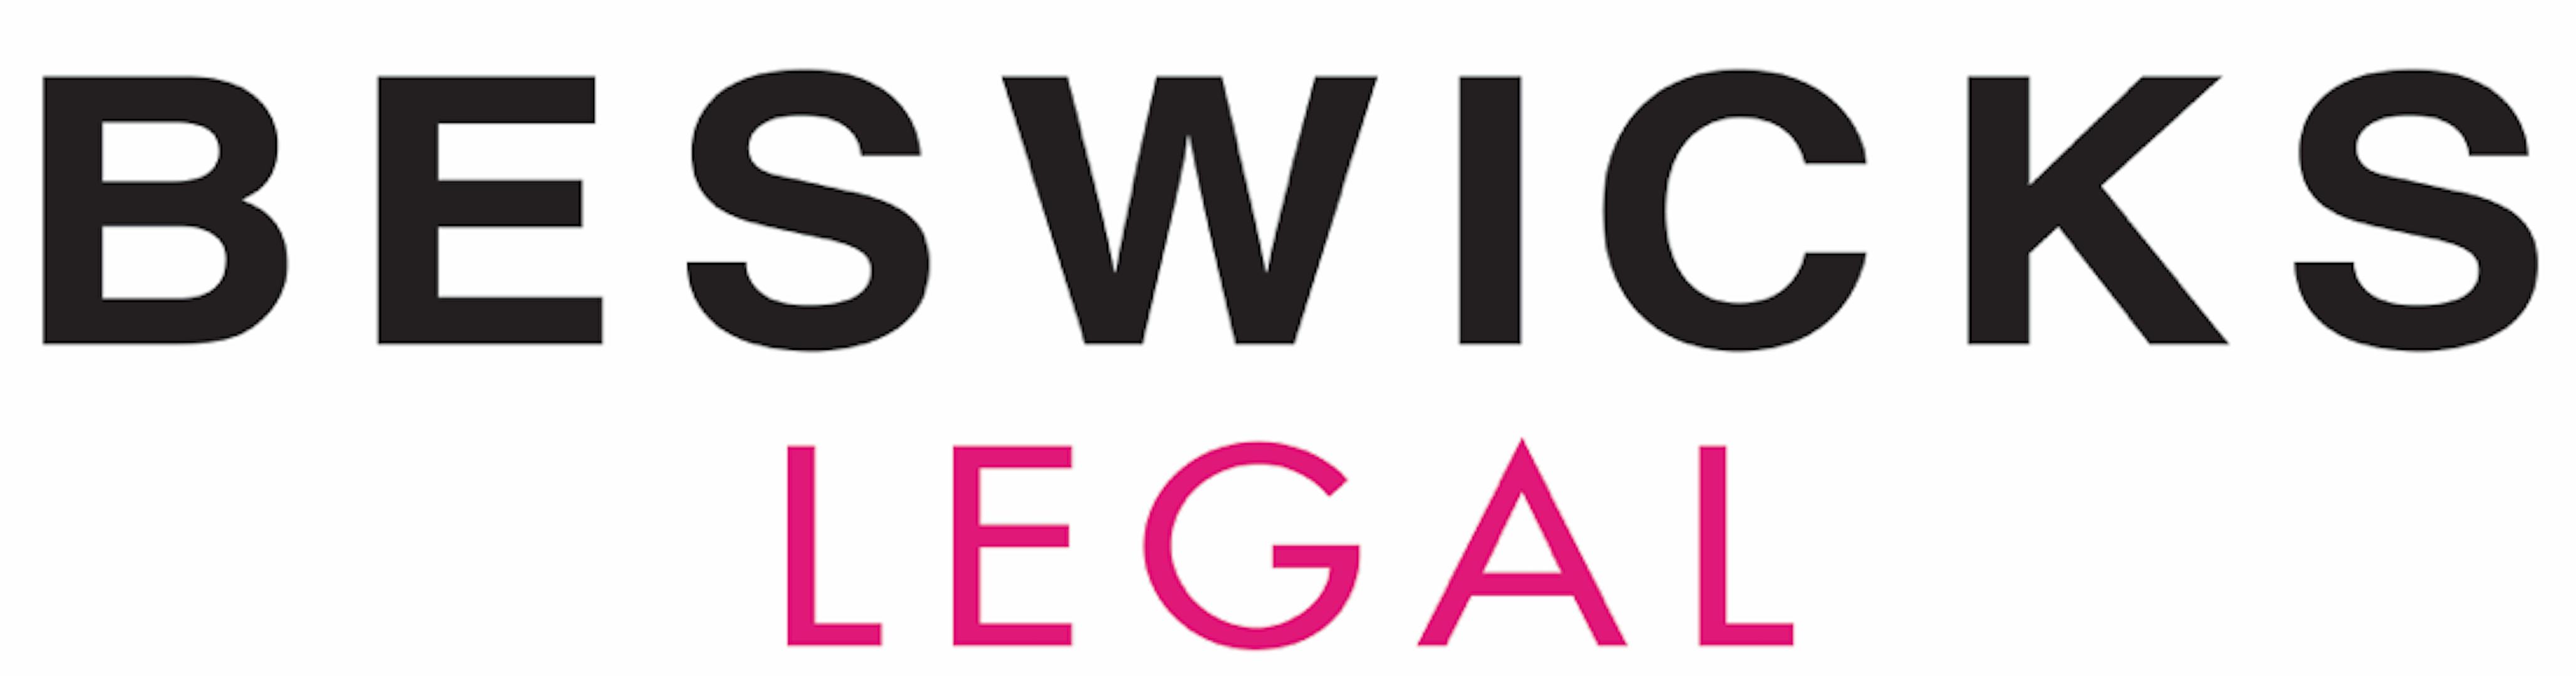 Beswicks Logo